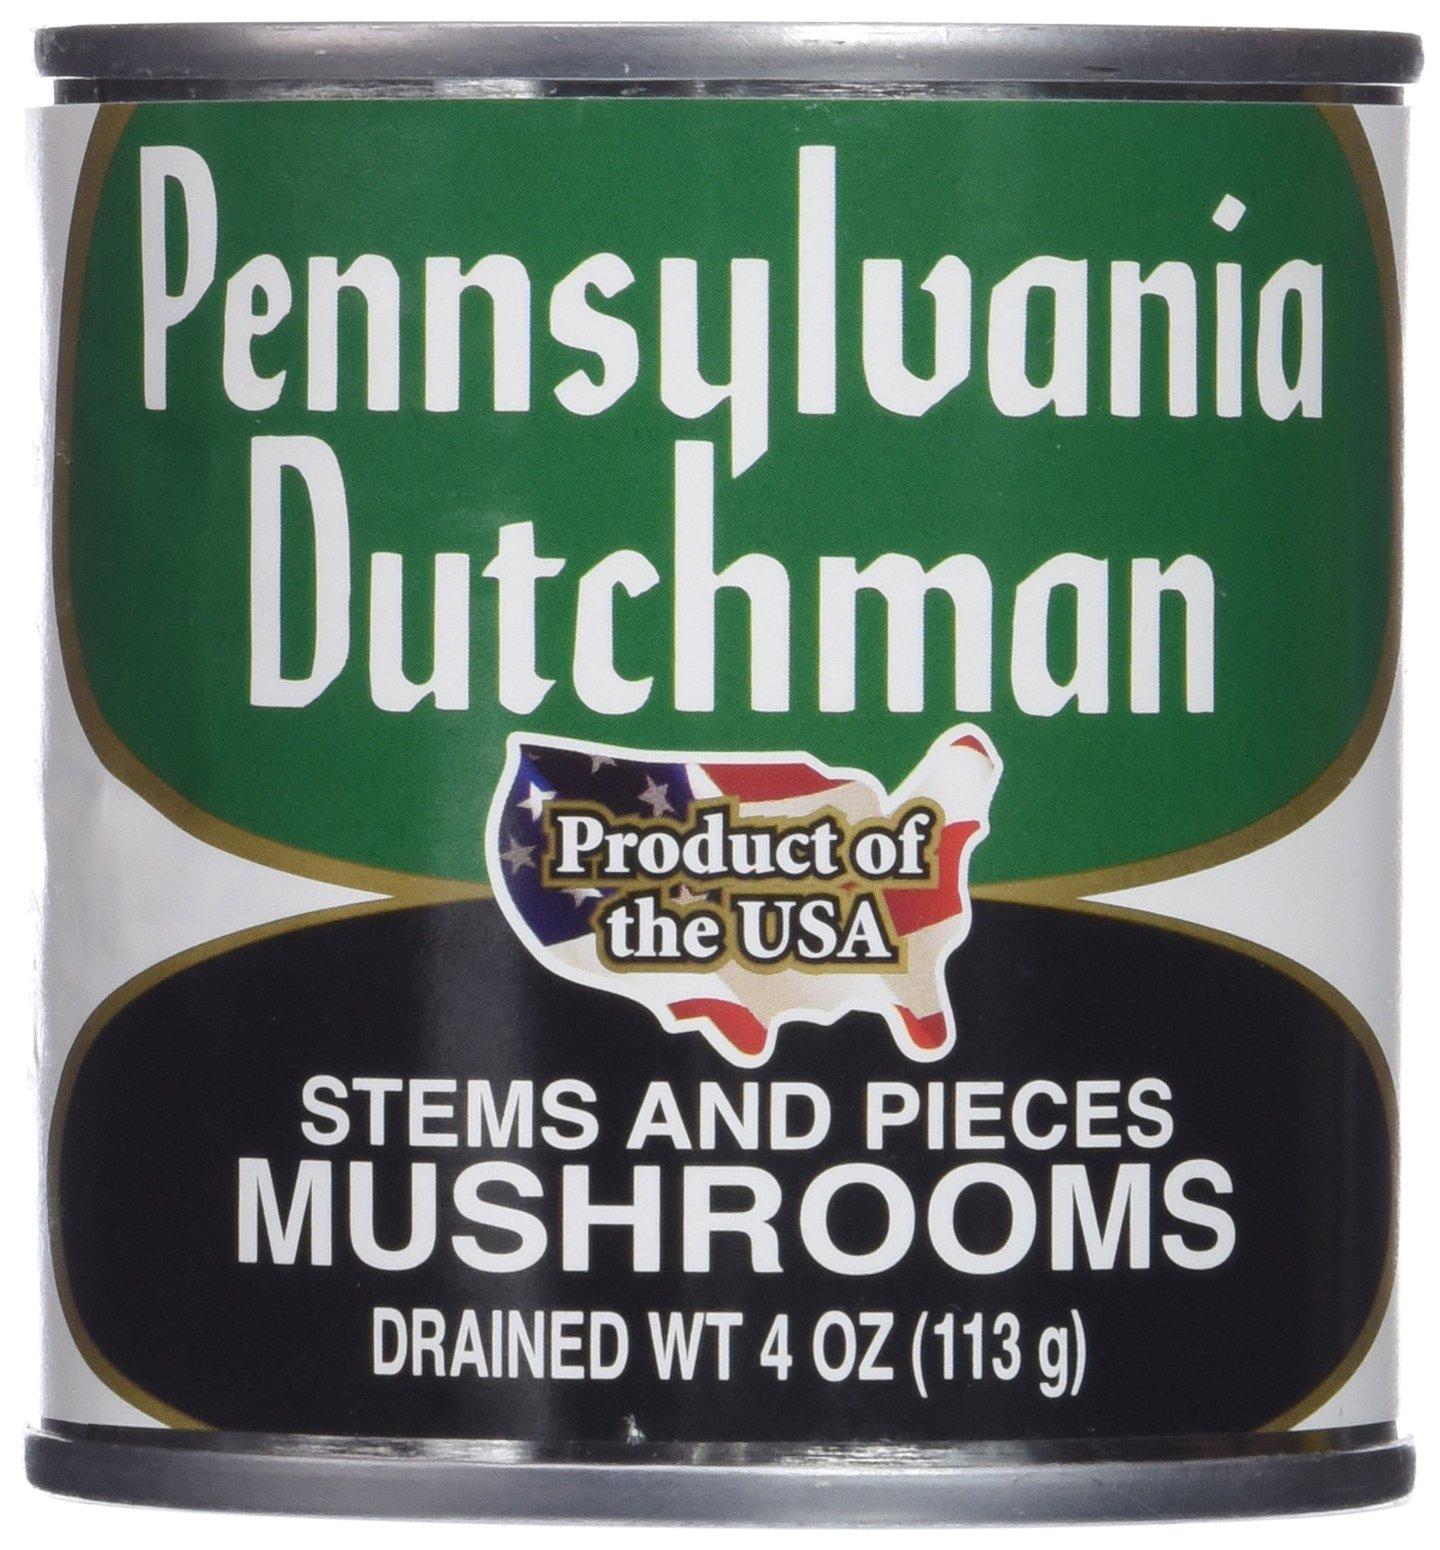 Pennsylvania Dutchman Canned Mushrooms - 12/4 oz. cans by Pennsylvania Dutchman